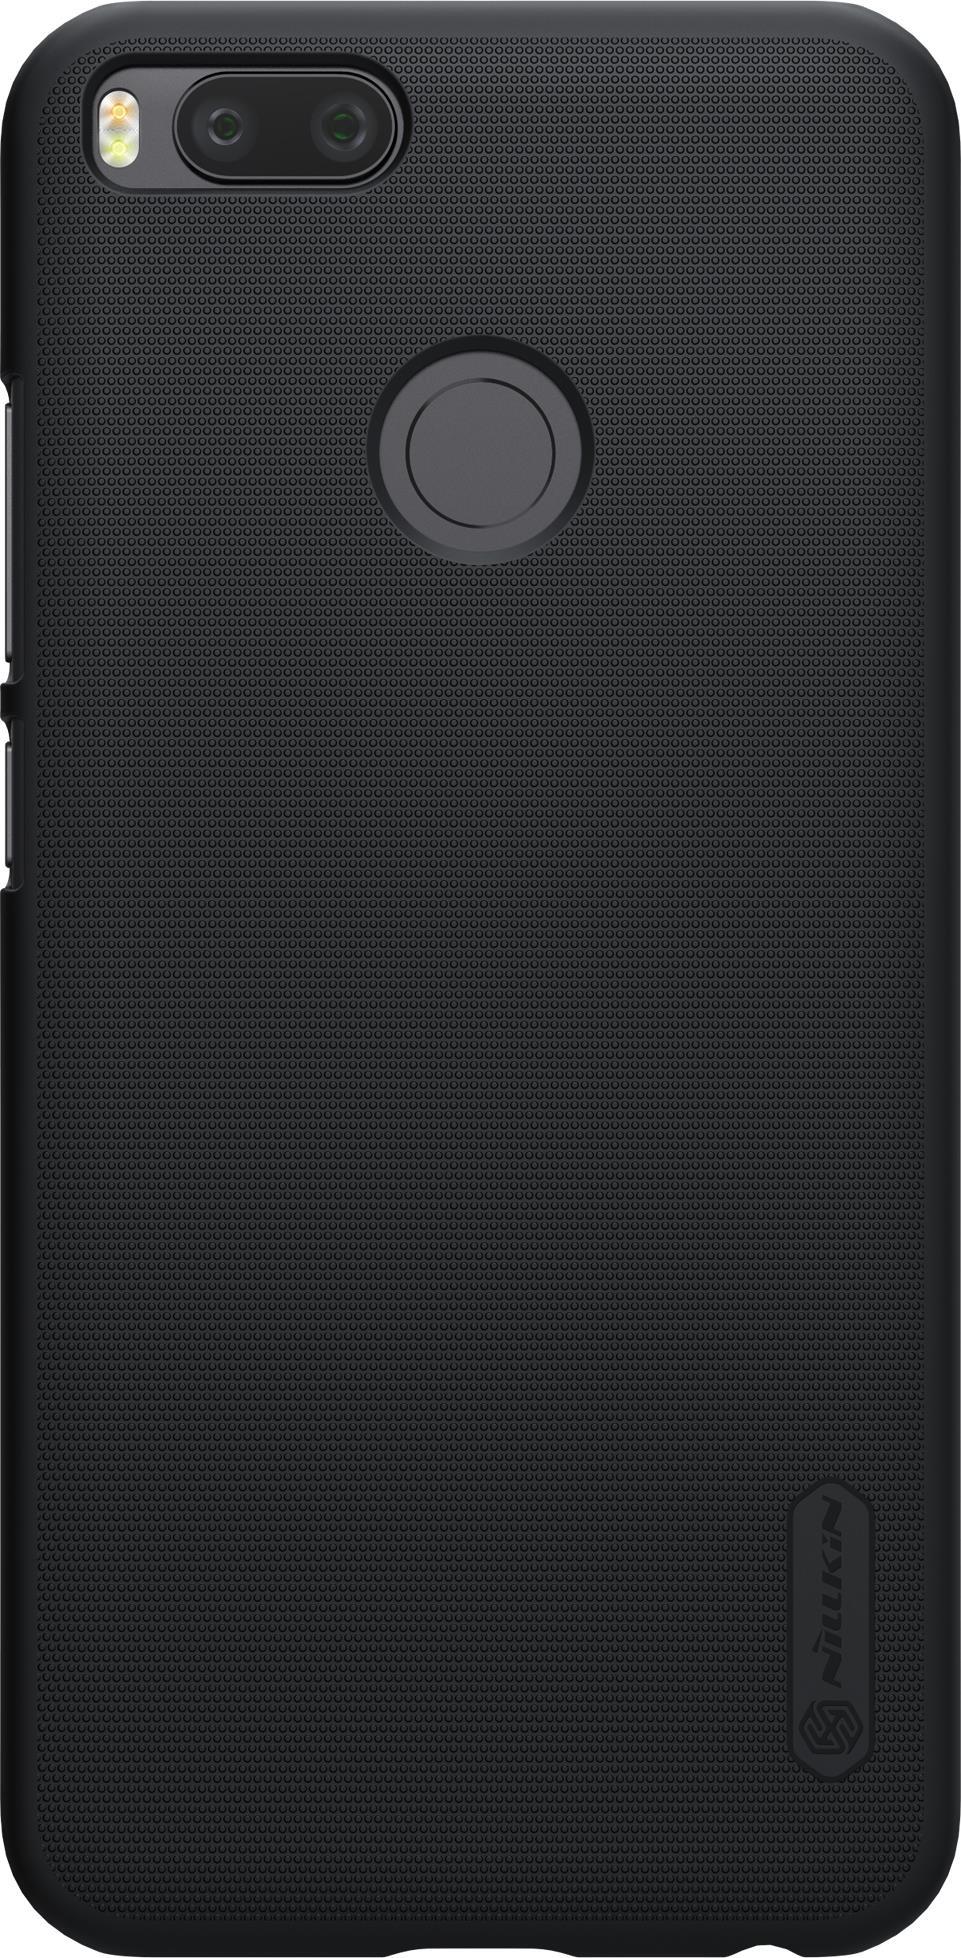 Накладка Nillkin Super Frosted для Xiaomi Mi 5X/A1, 6902048145238, черный